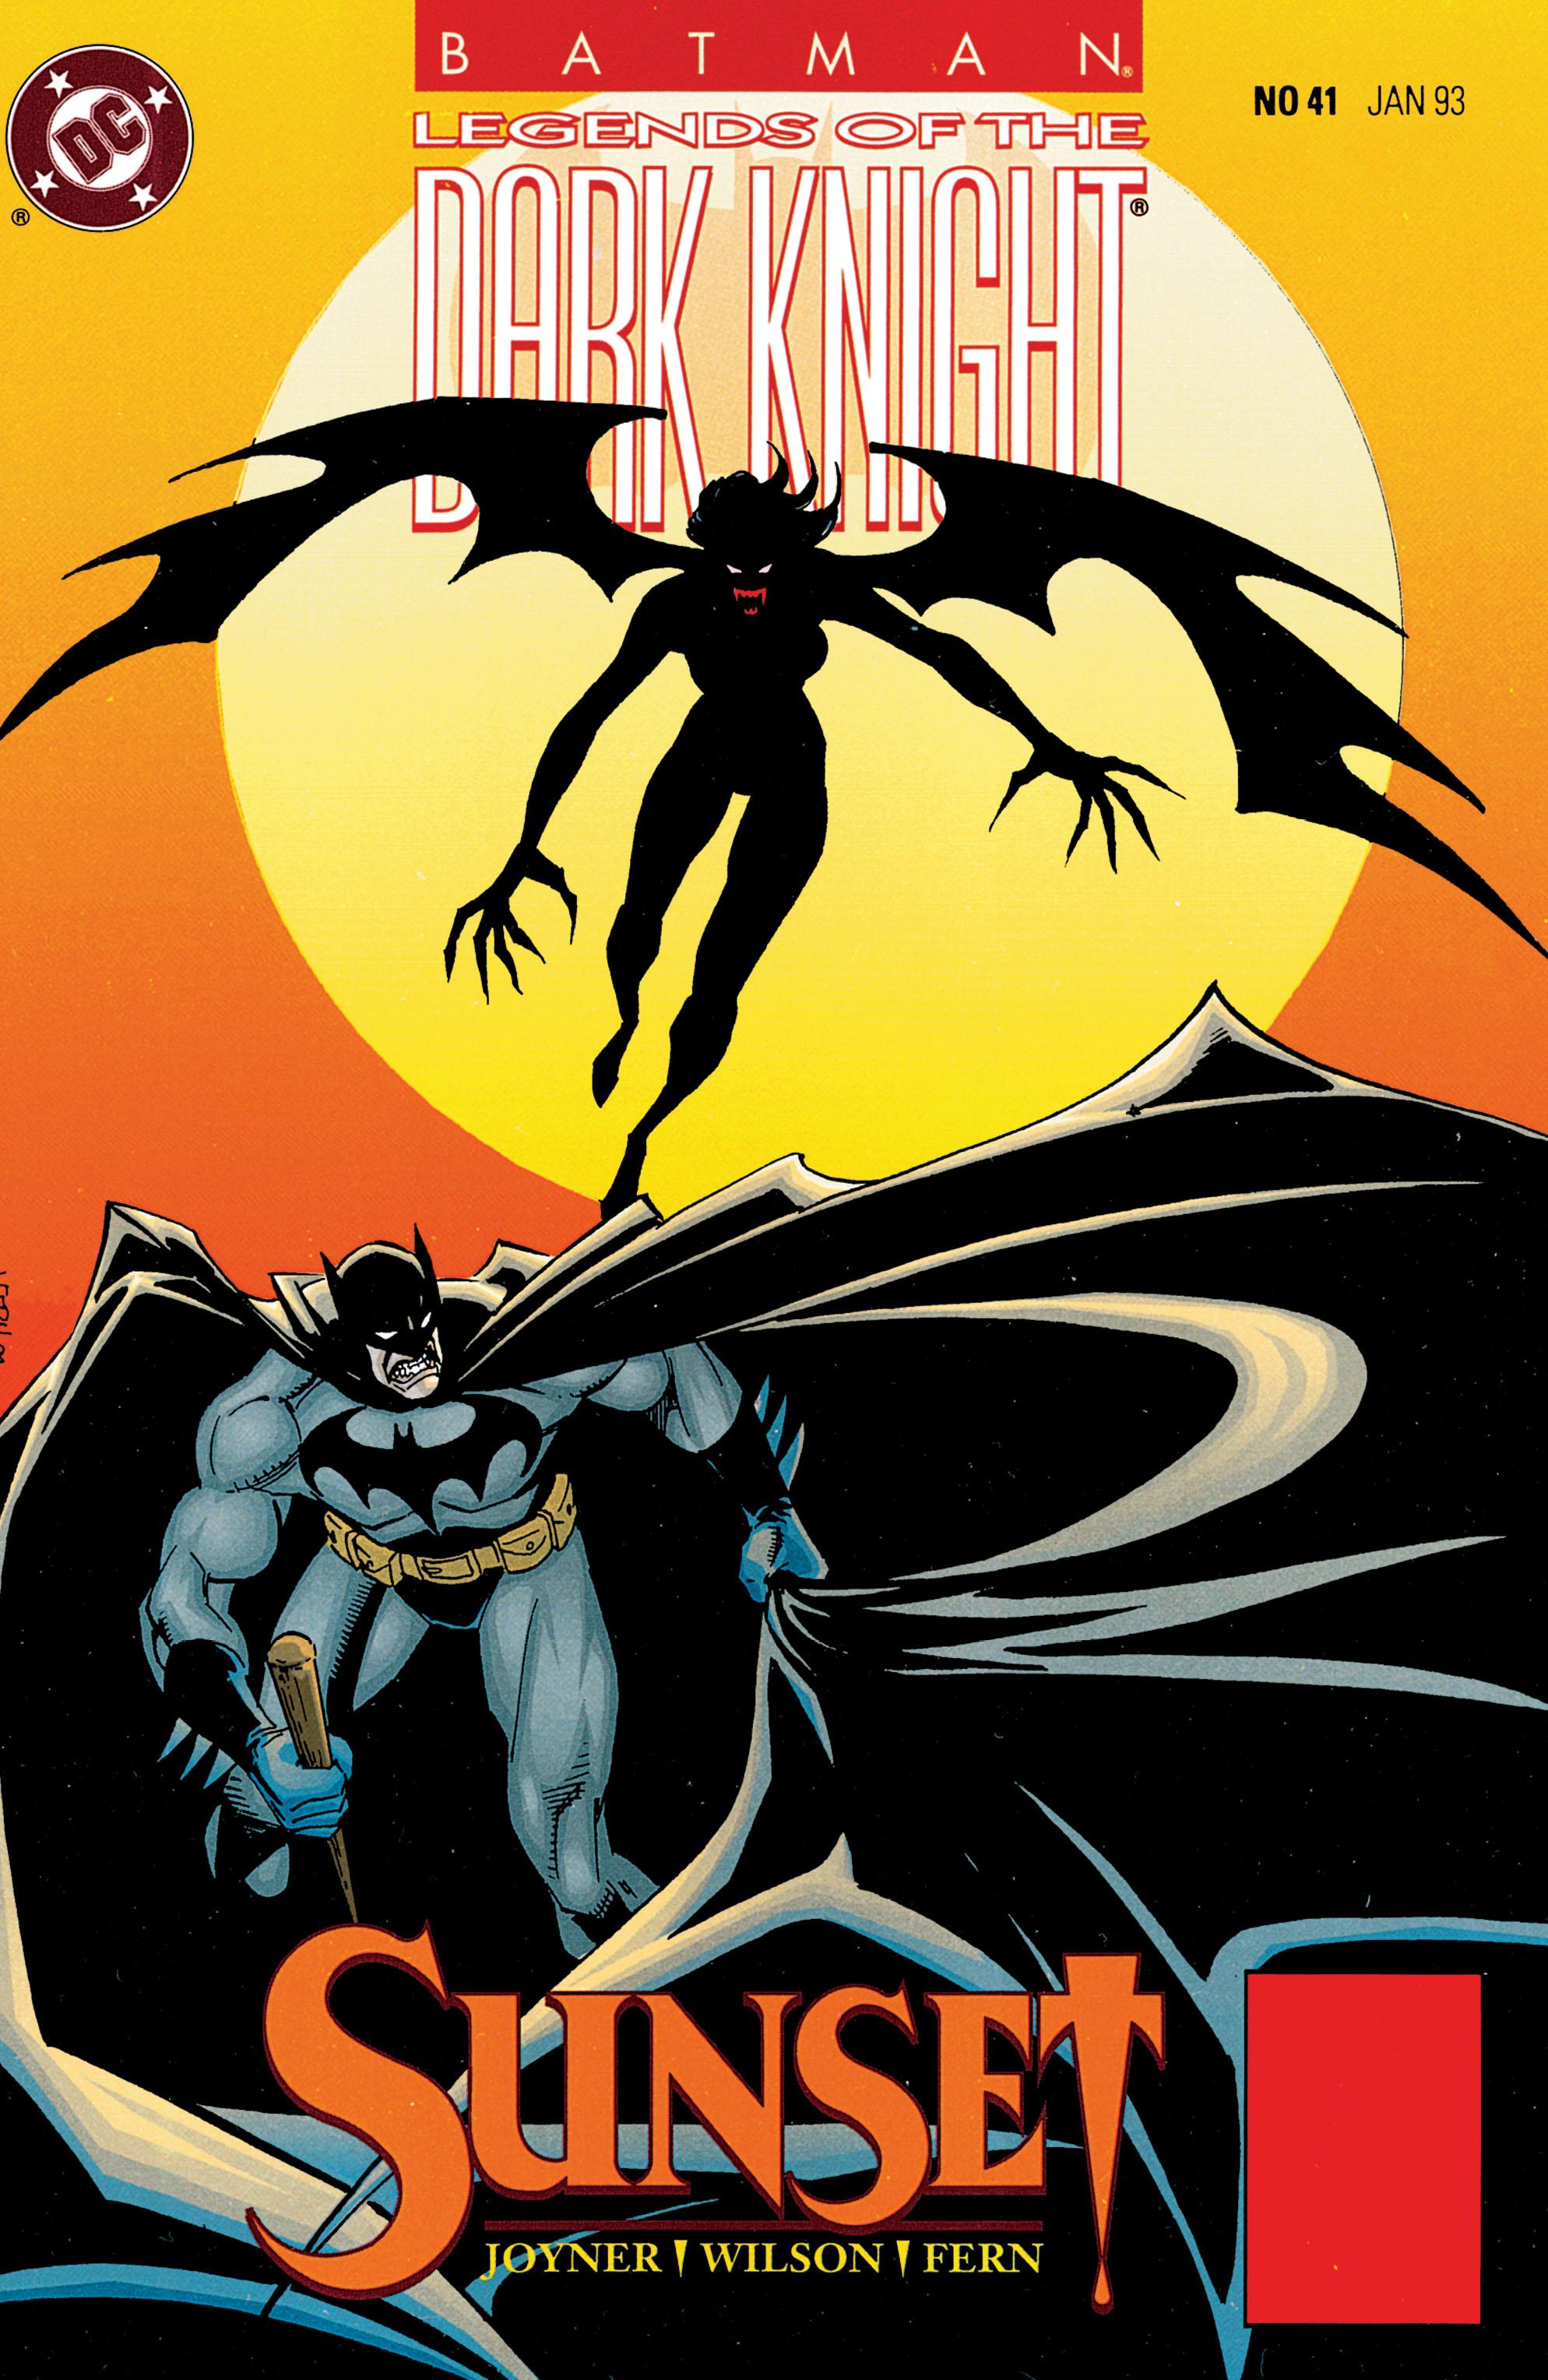 Batman: Legends of the Dark Knight 41 Page 1